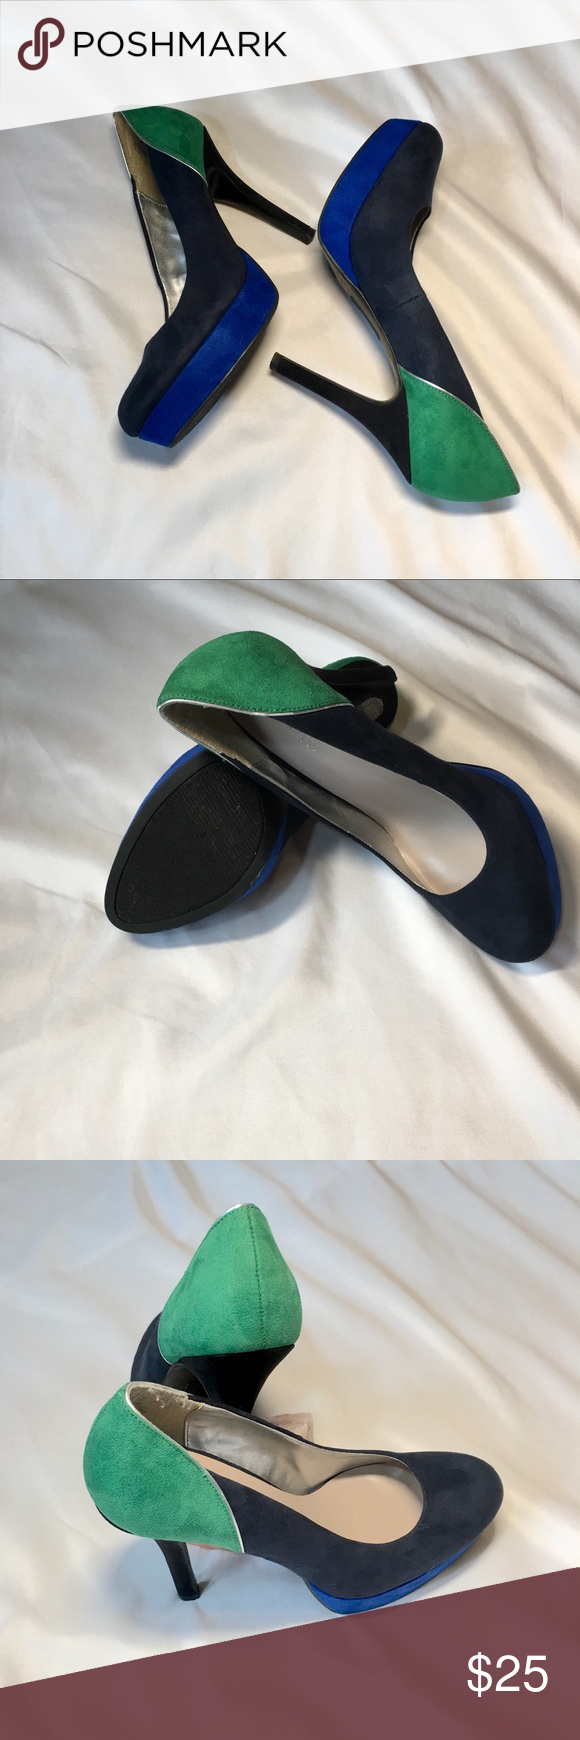 Heels for dark green dress  NINE u CO Heels  My Posh Picks  Pinterest  Blue toes Green heels